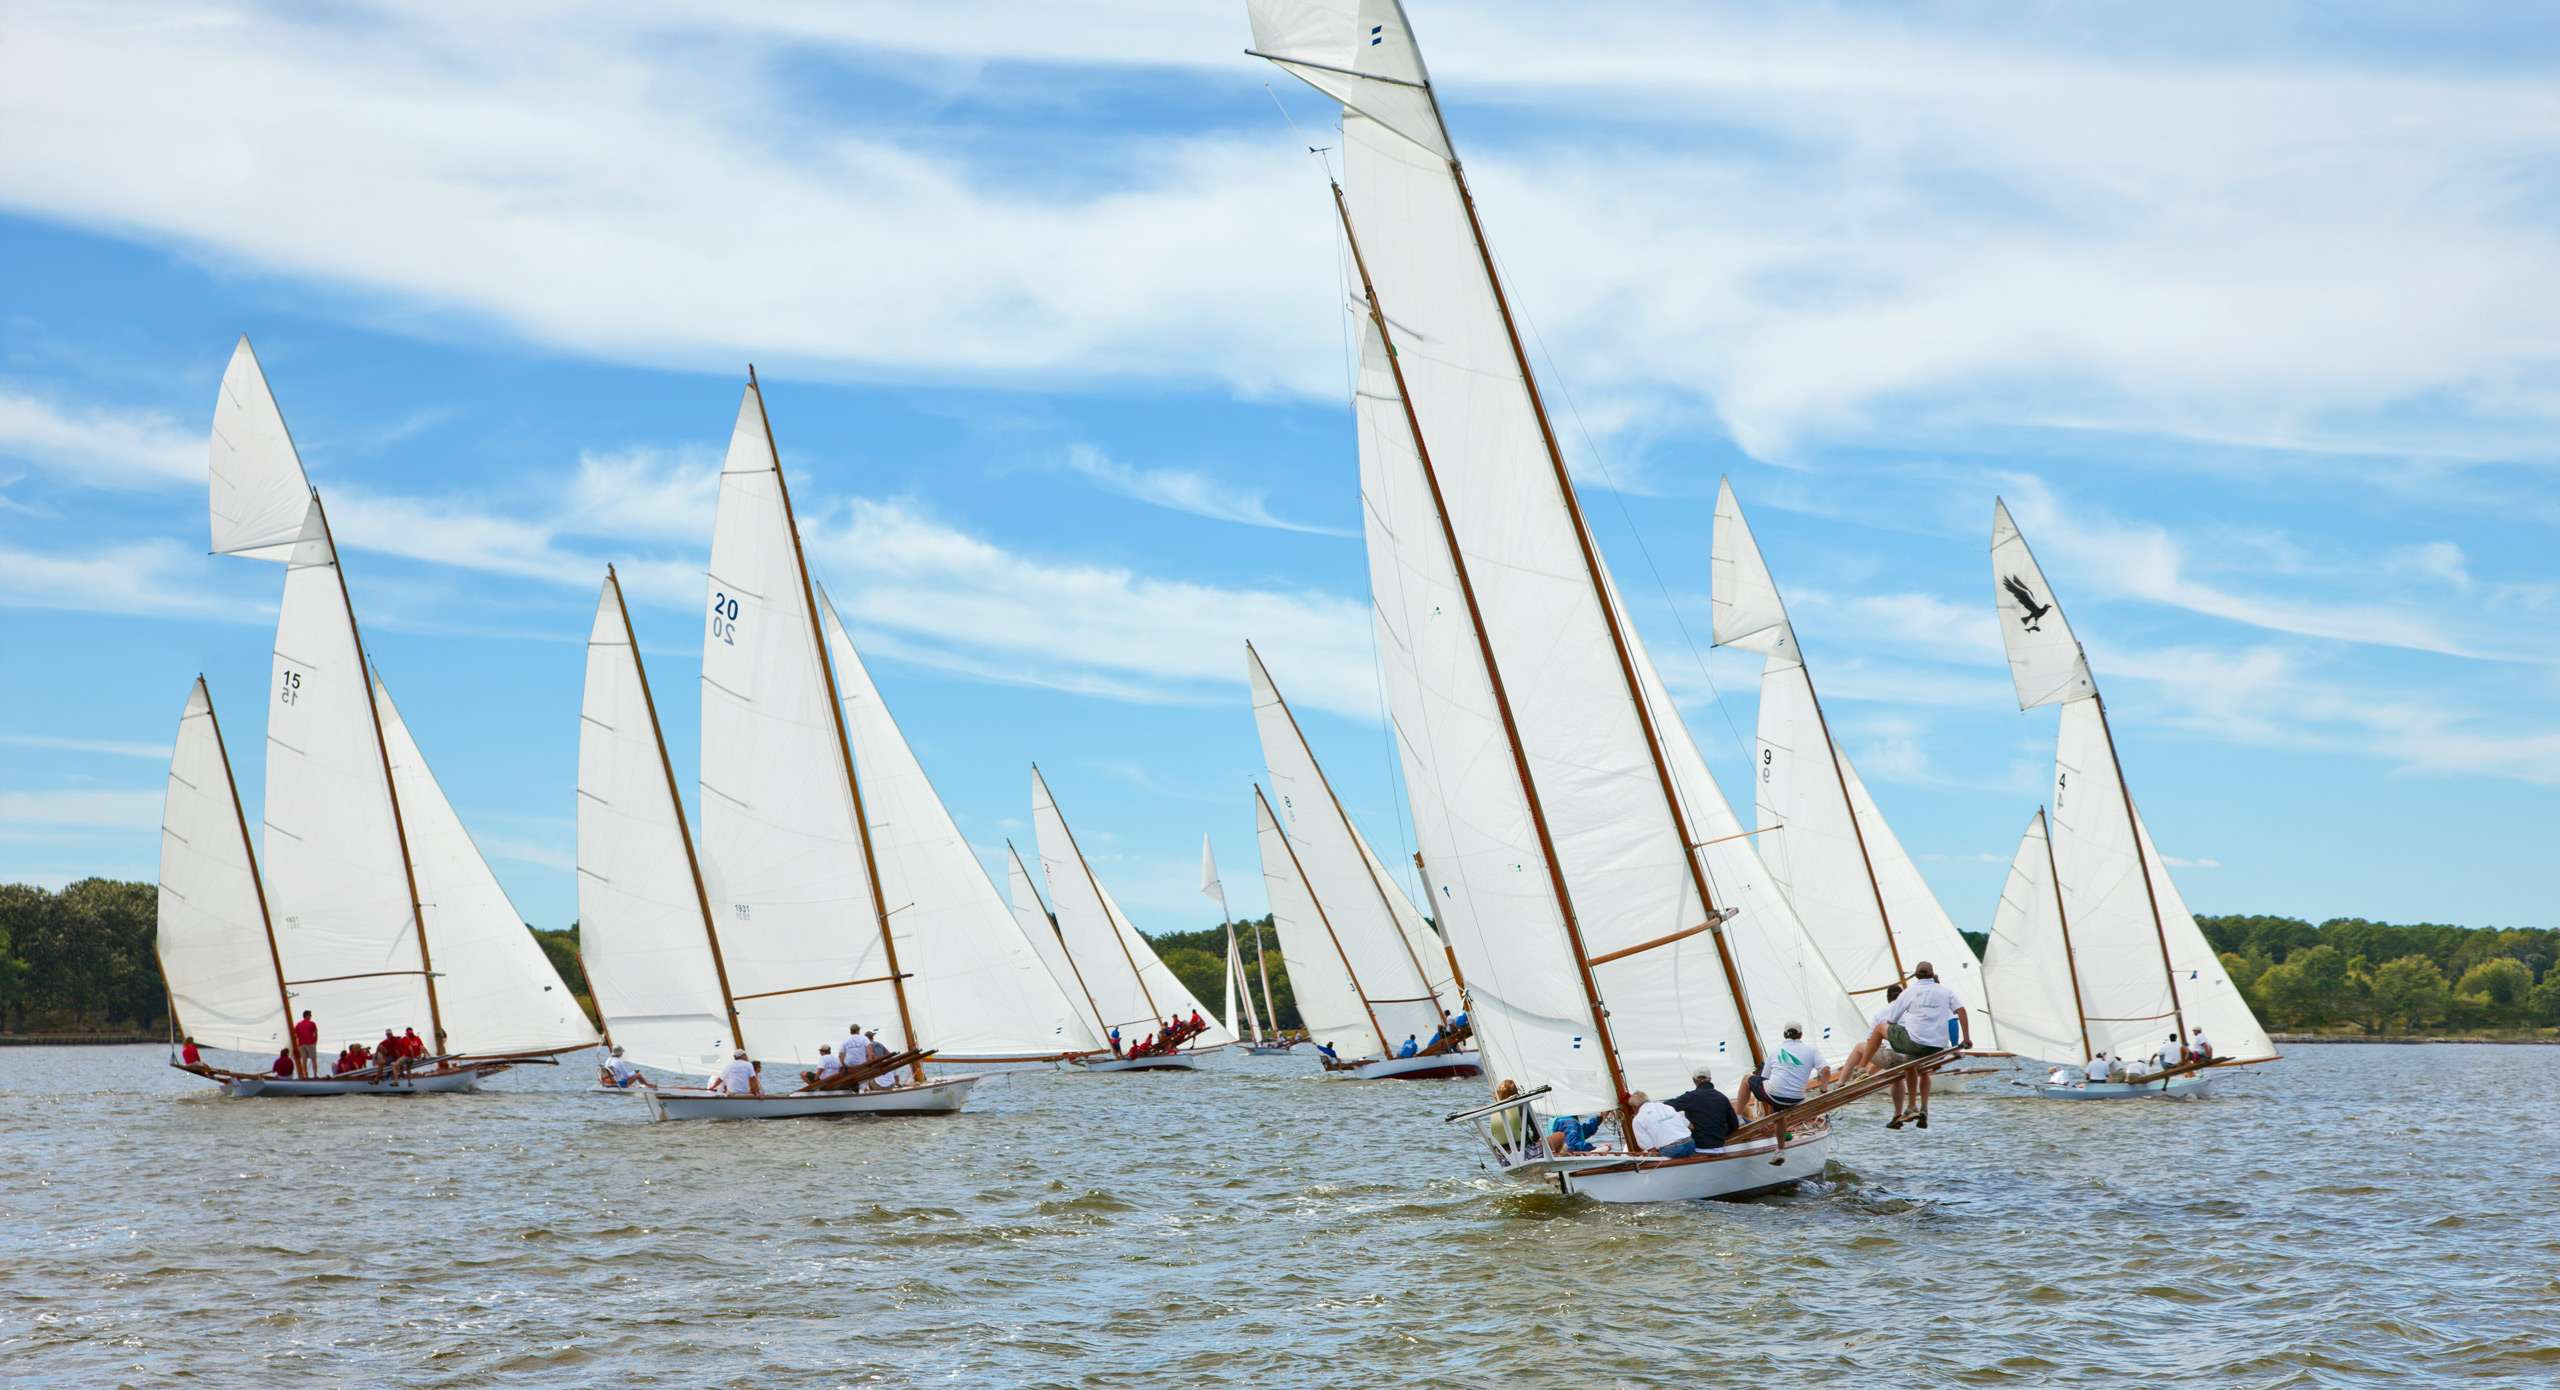 PORTFOLIO - Sailing - Log Canoes #23   PCG569